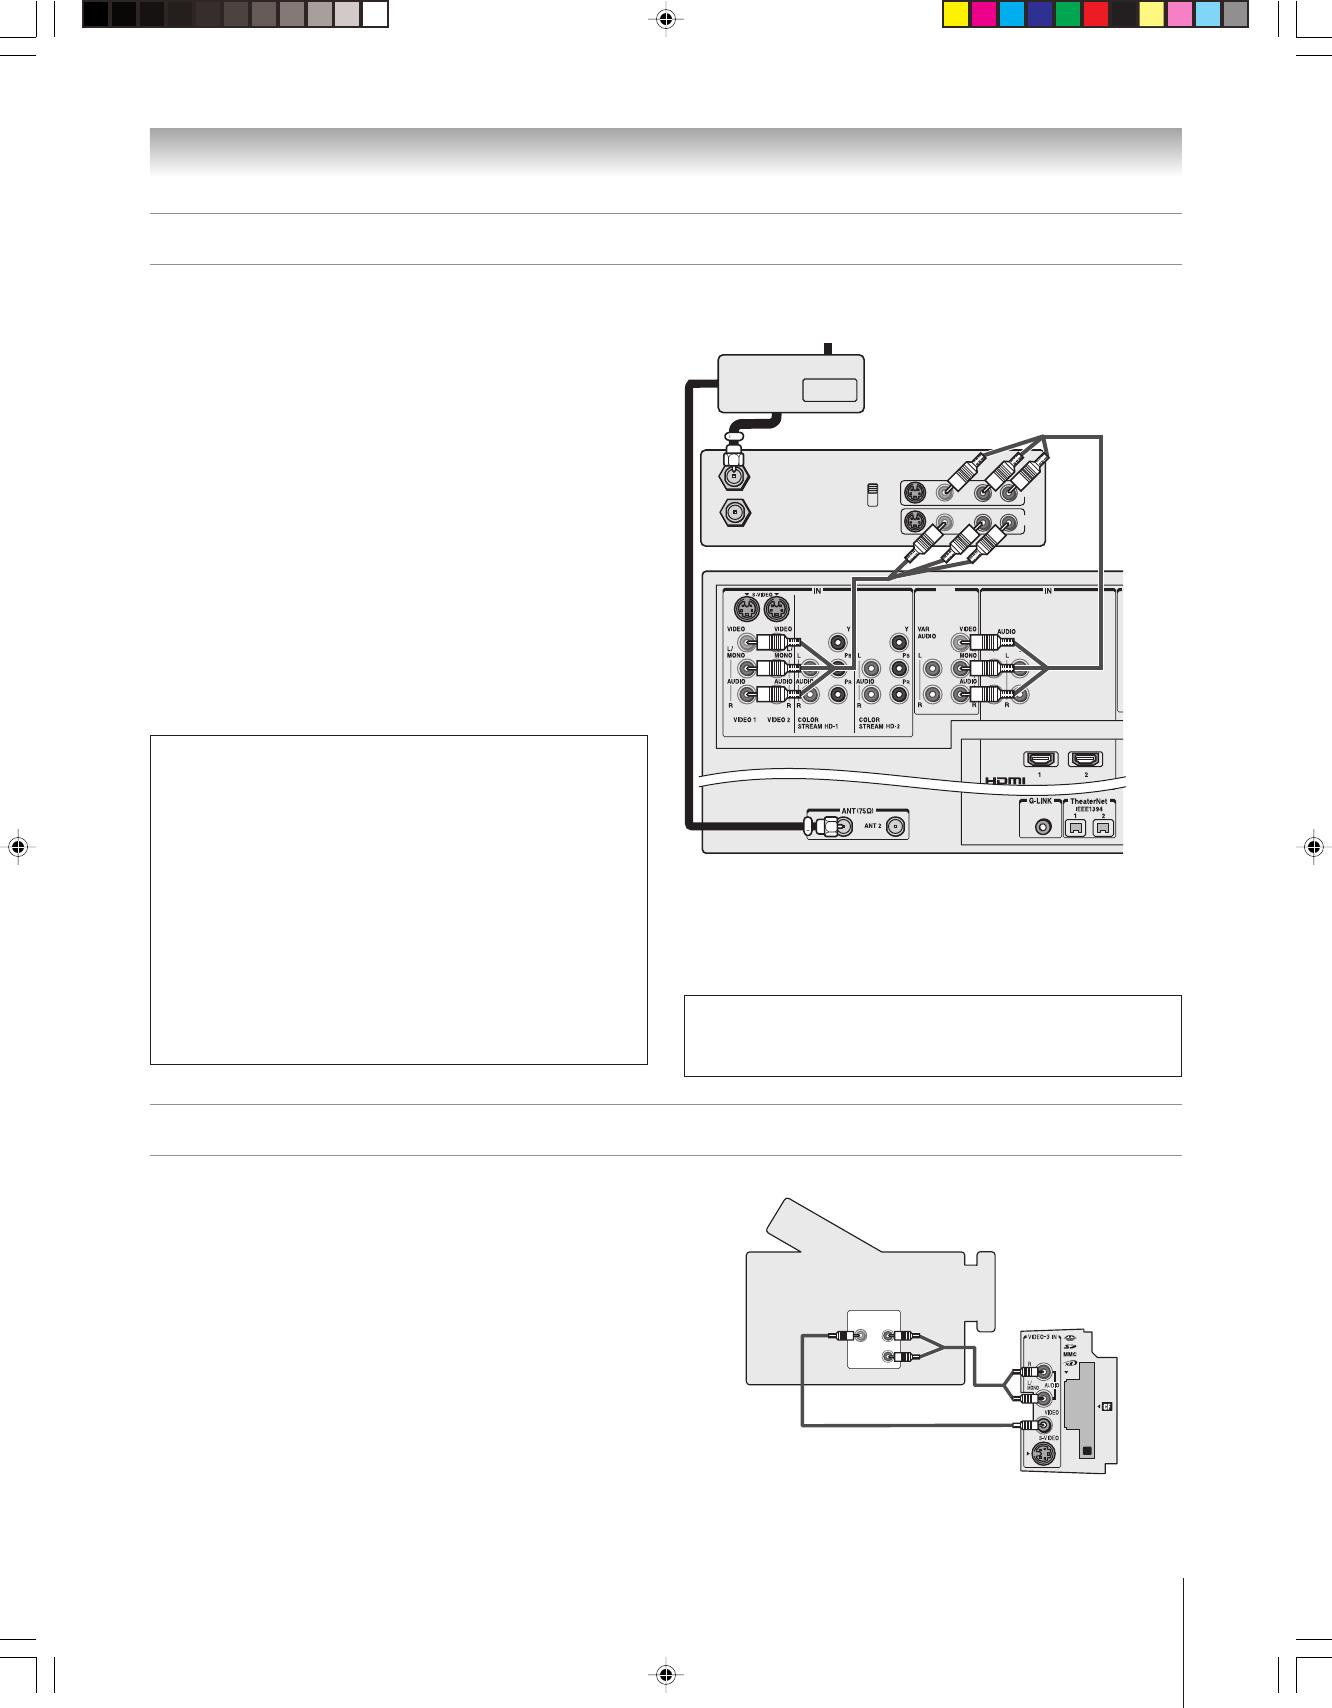 Wiring Toshiba Diagram Laptop3613u 1mpc